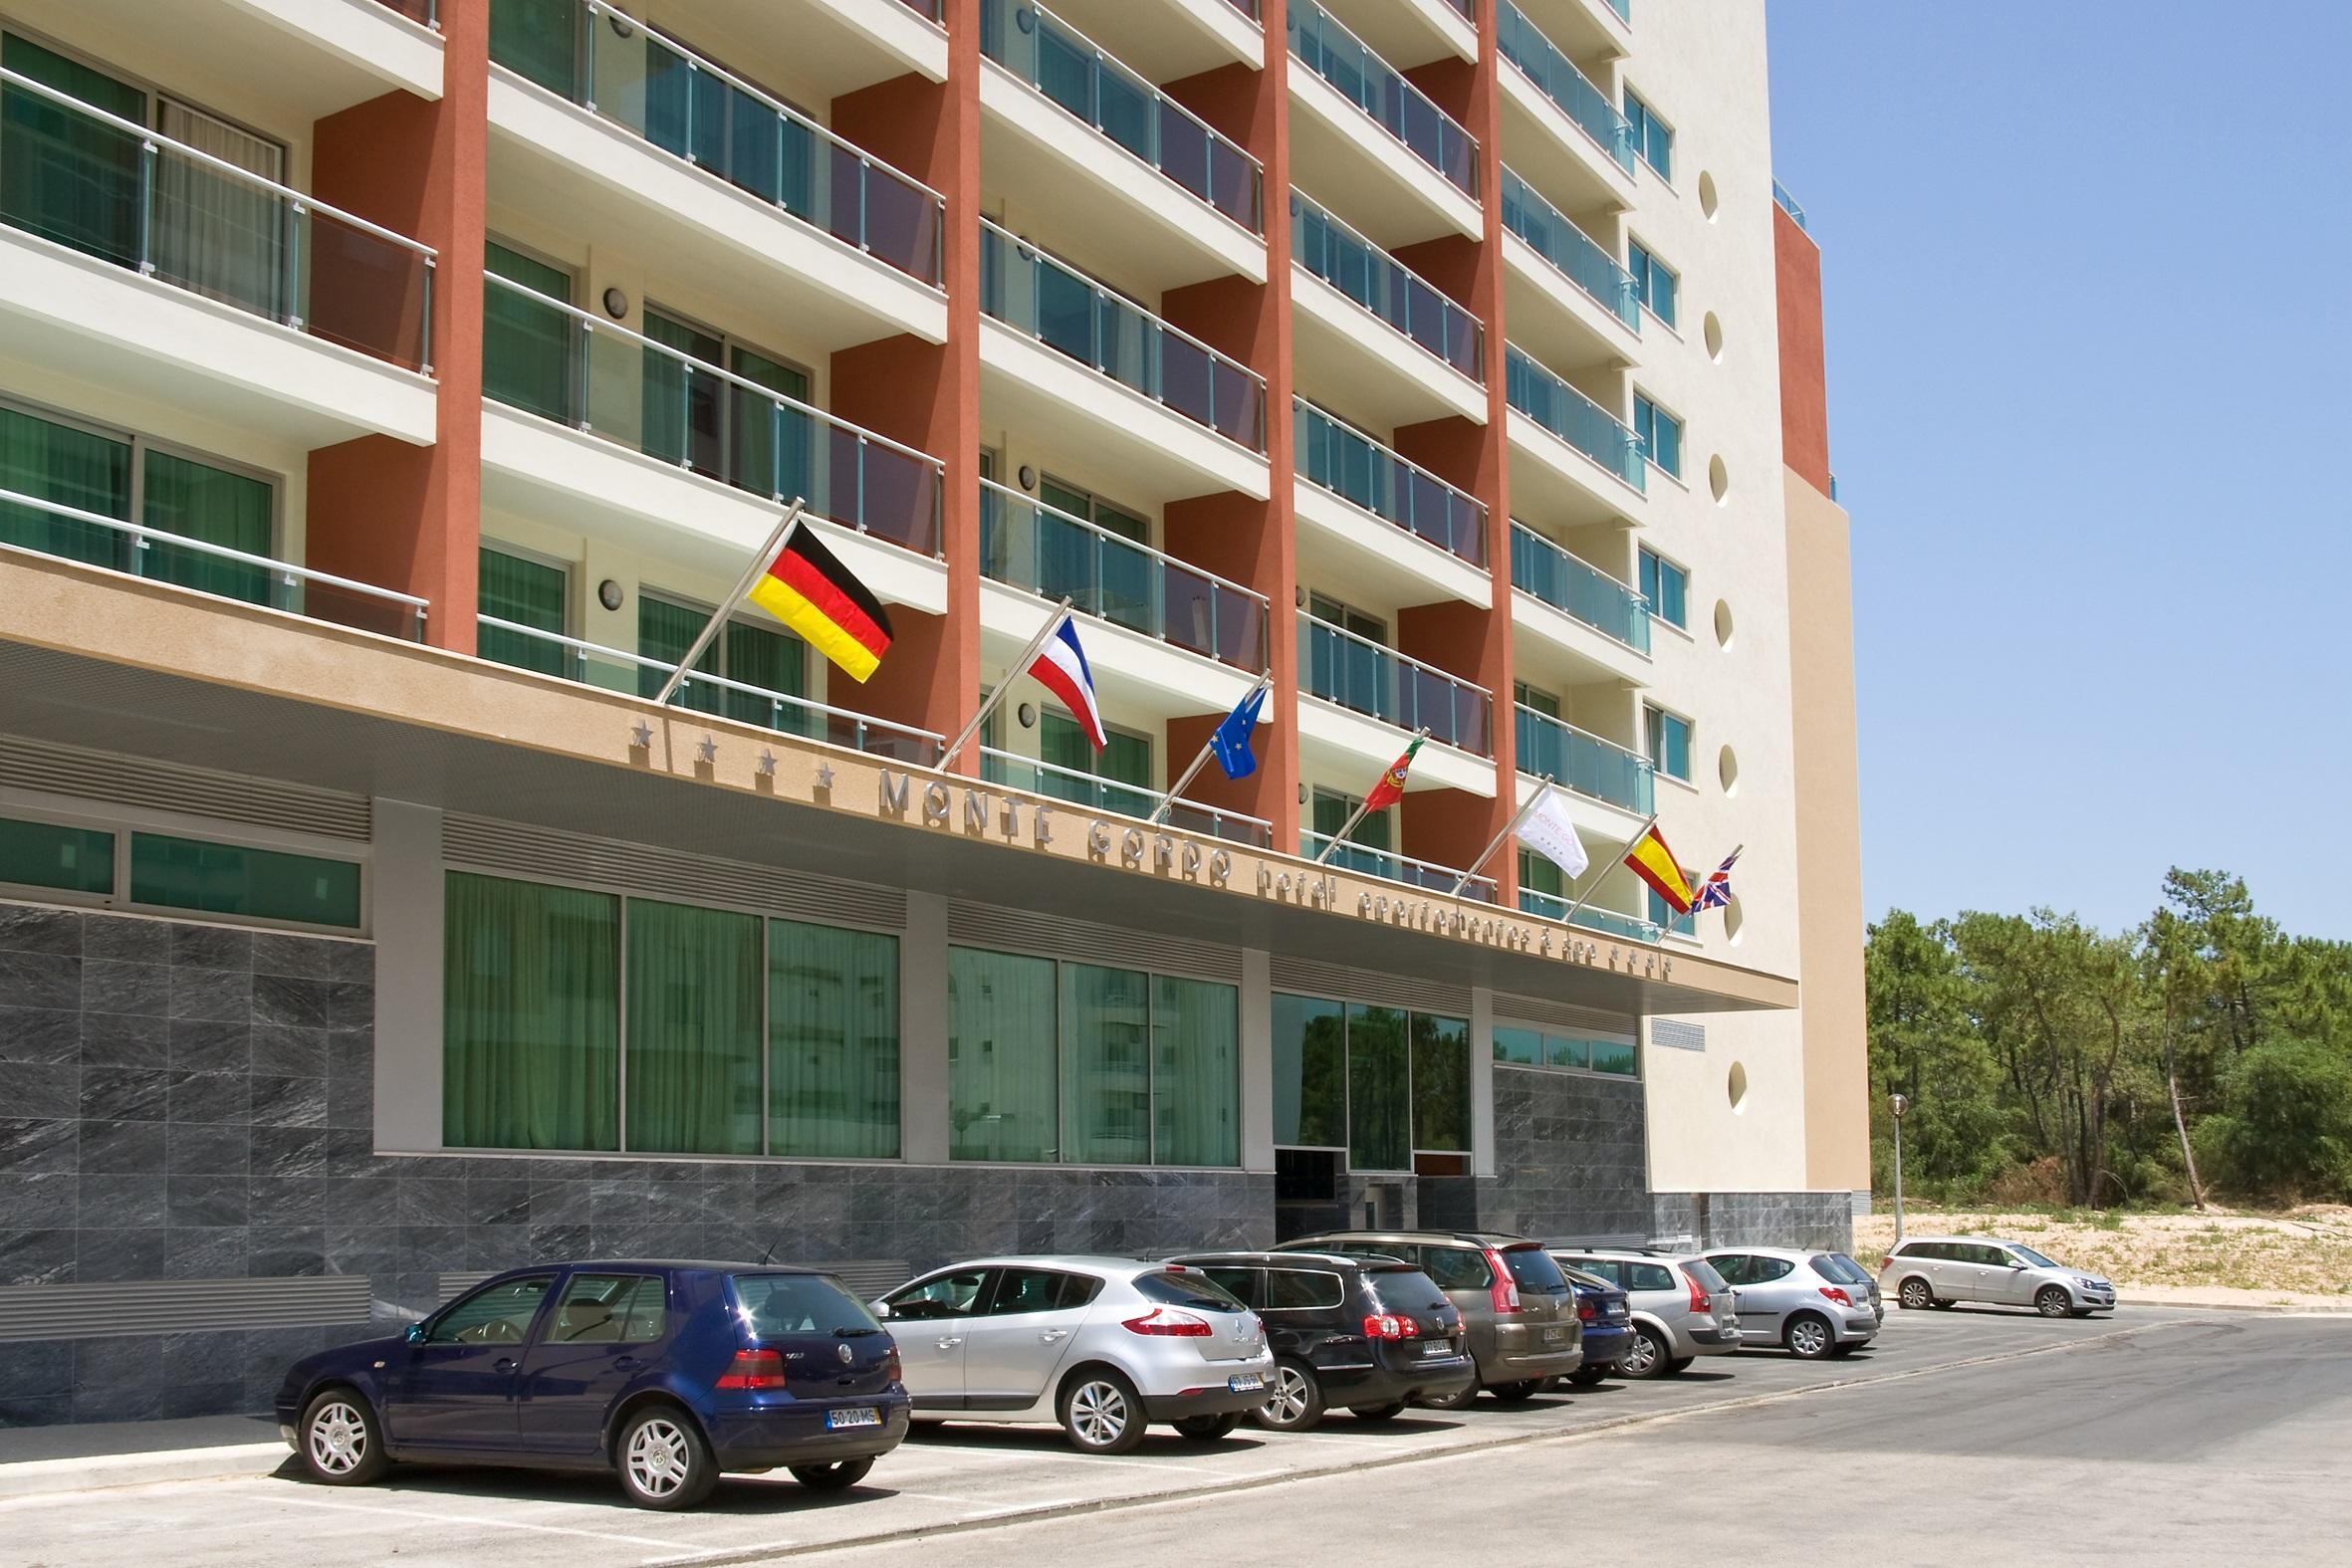 Montegordo Hotel Apartamentos & Spa, Vila Real de Santo António